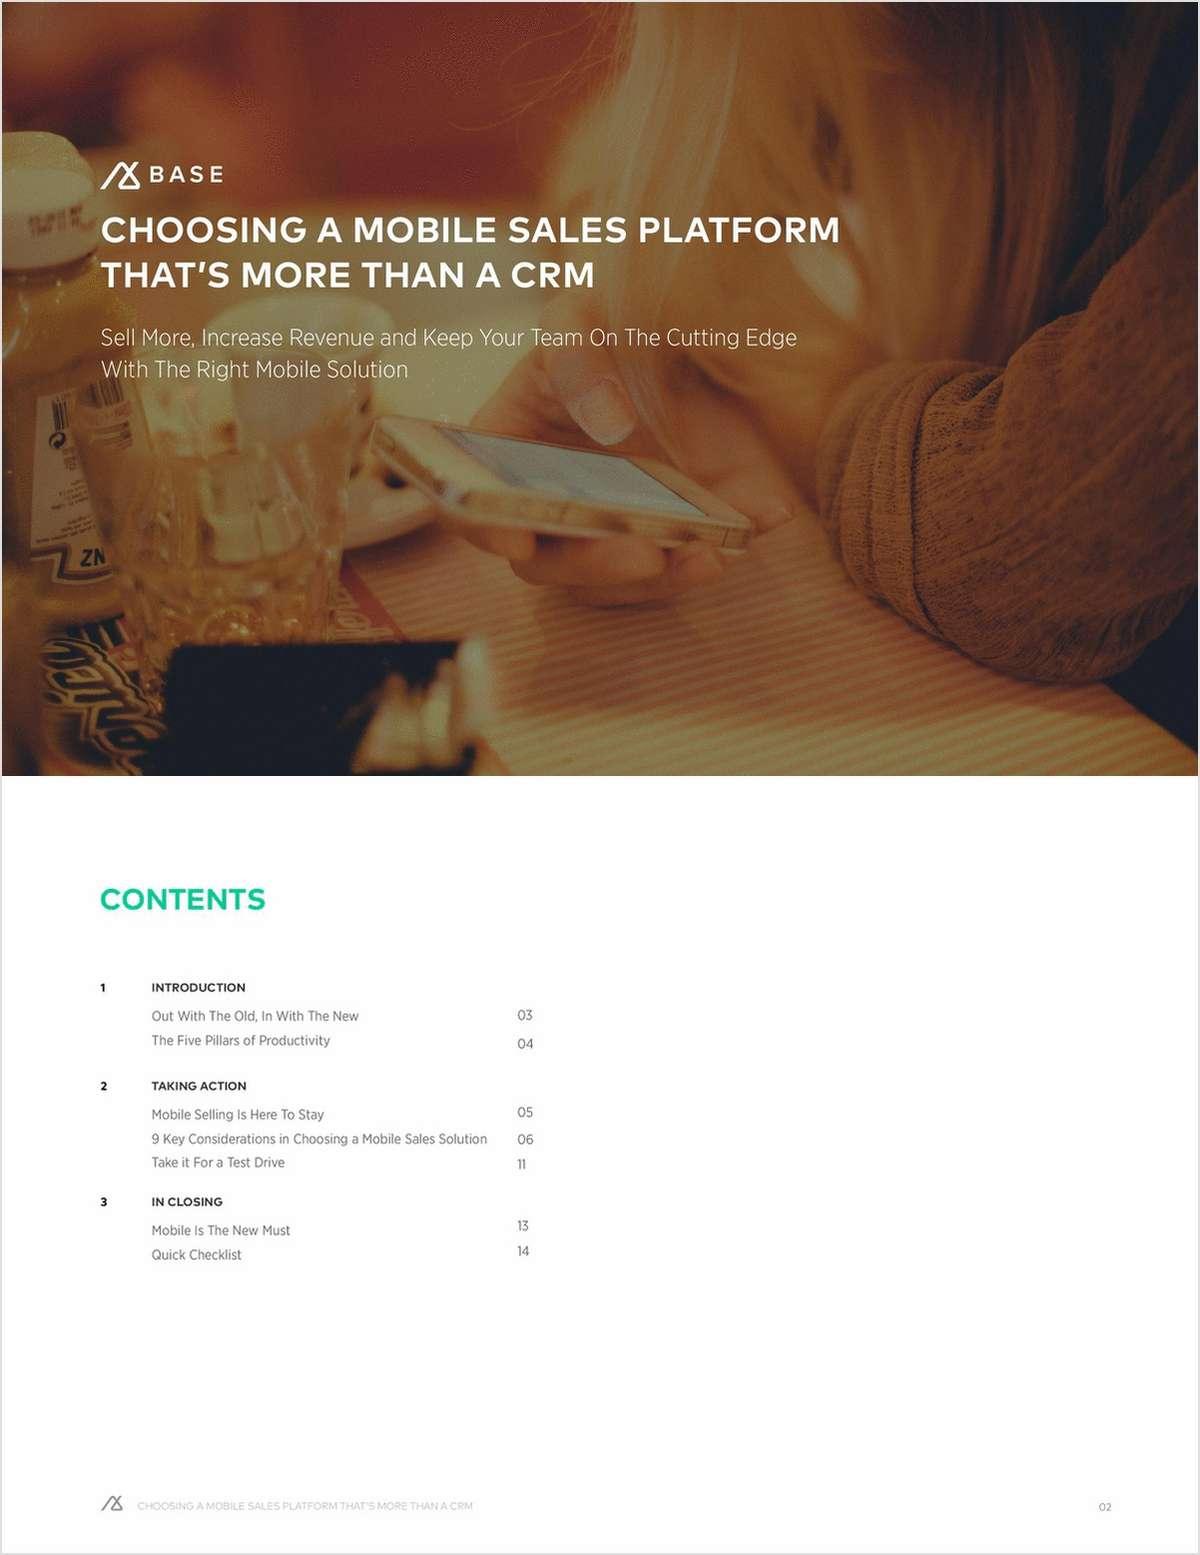 Choosing a Mobile Sales Platform That's More Than a CRM